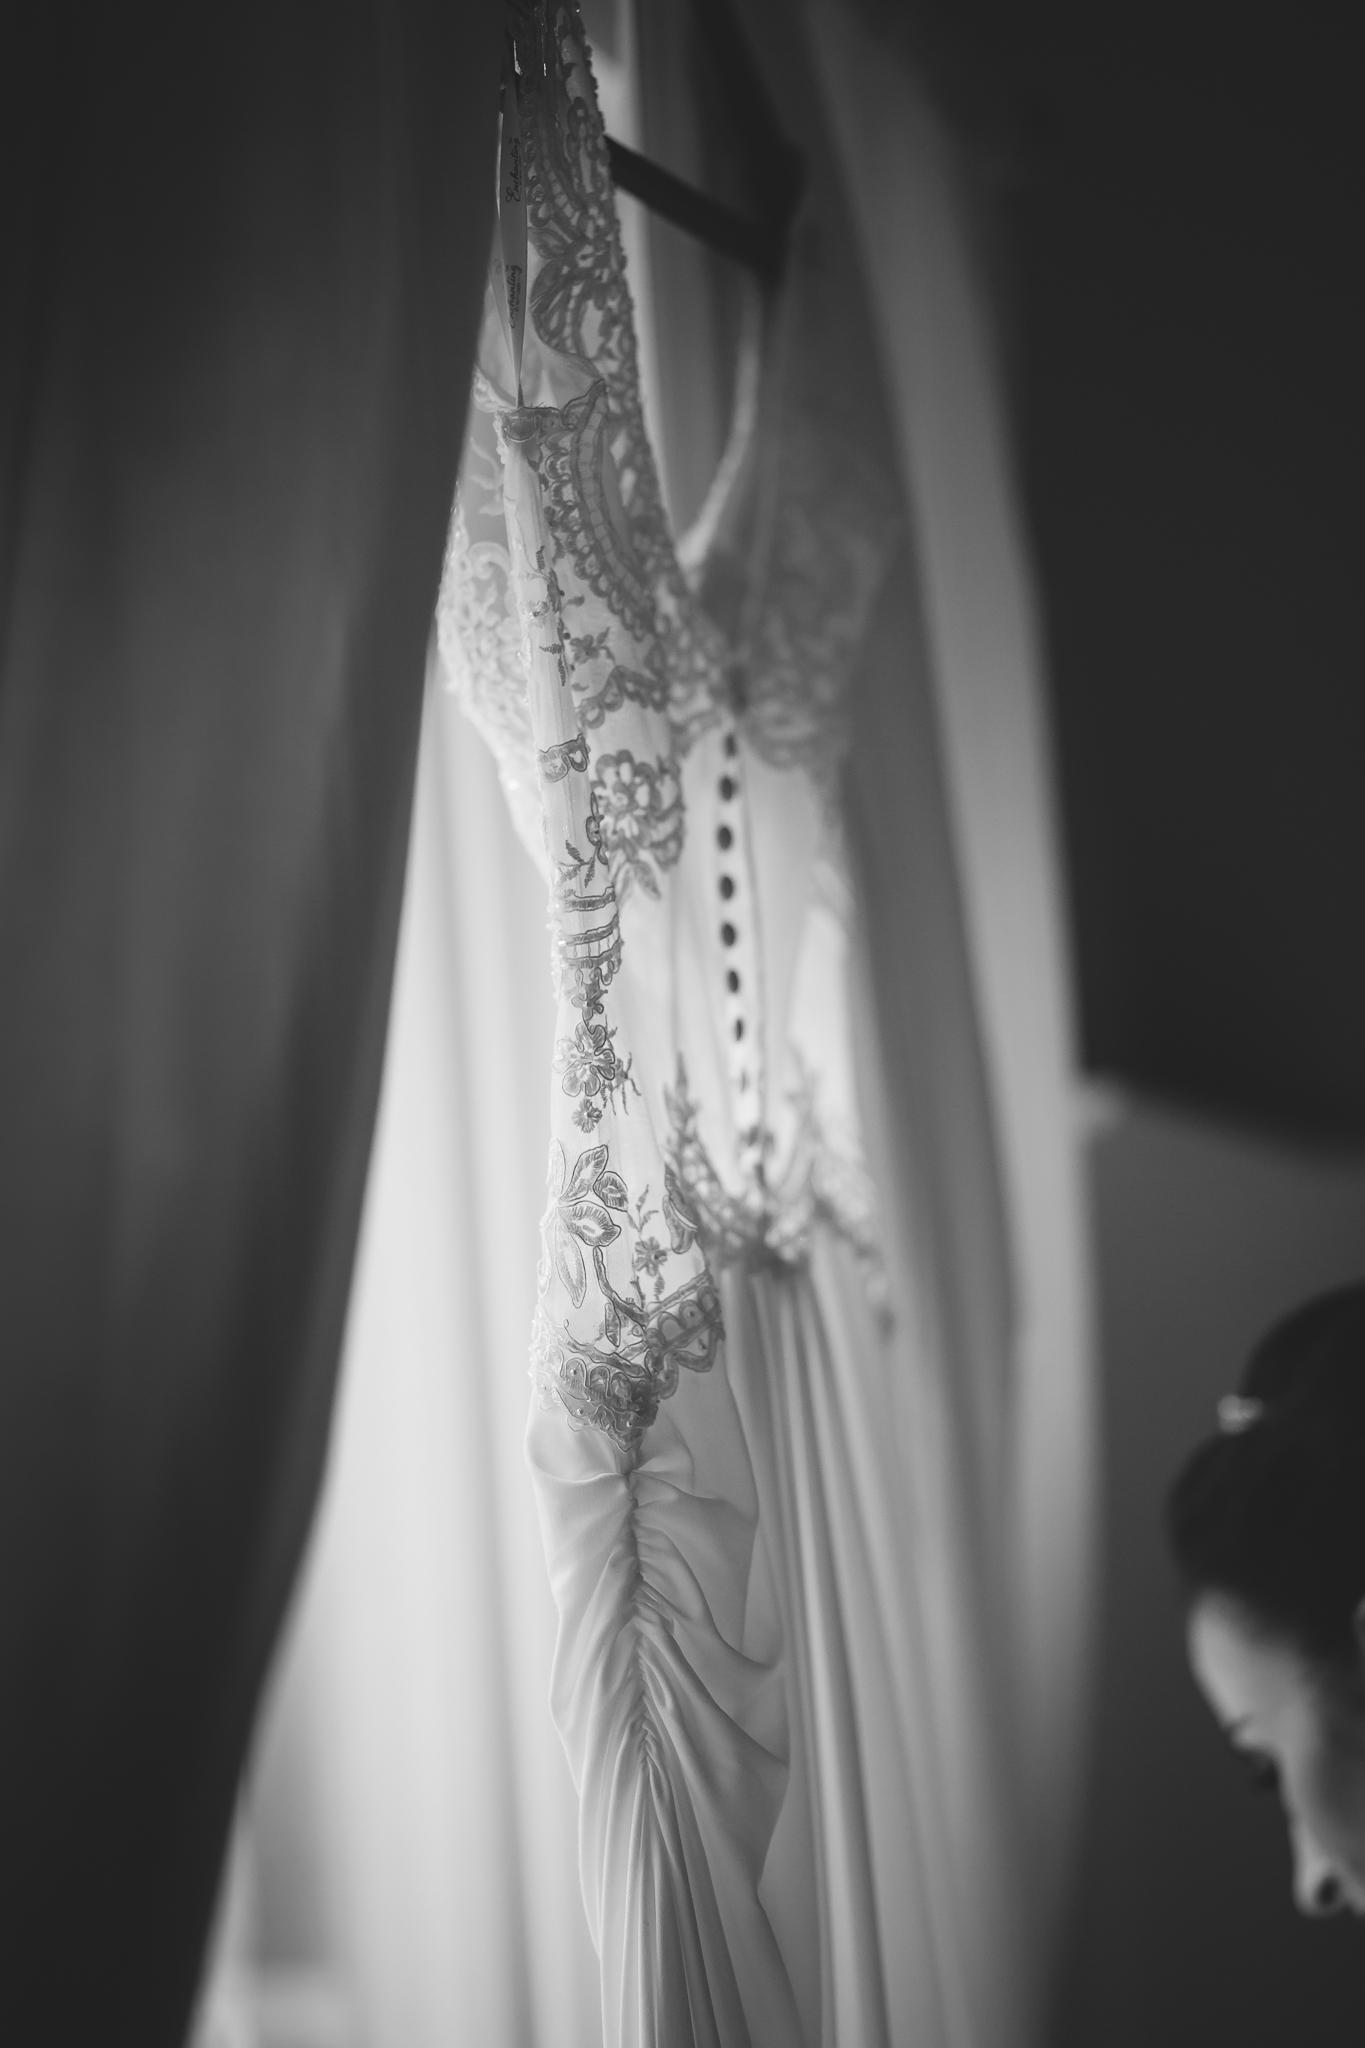 Amy D Photography- Barrie Wedding Photography- Bride Getting Ready- Muskoka Wedding Photography- Best Wedding Photographers (121 of 130).jpg